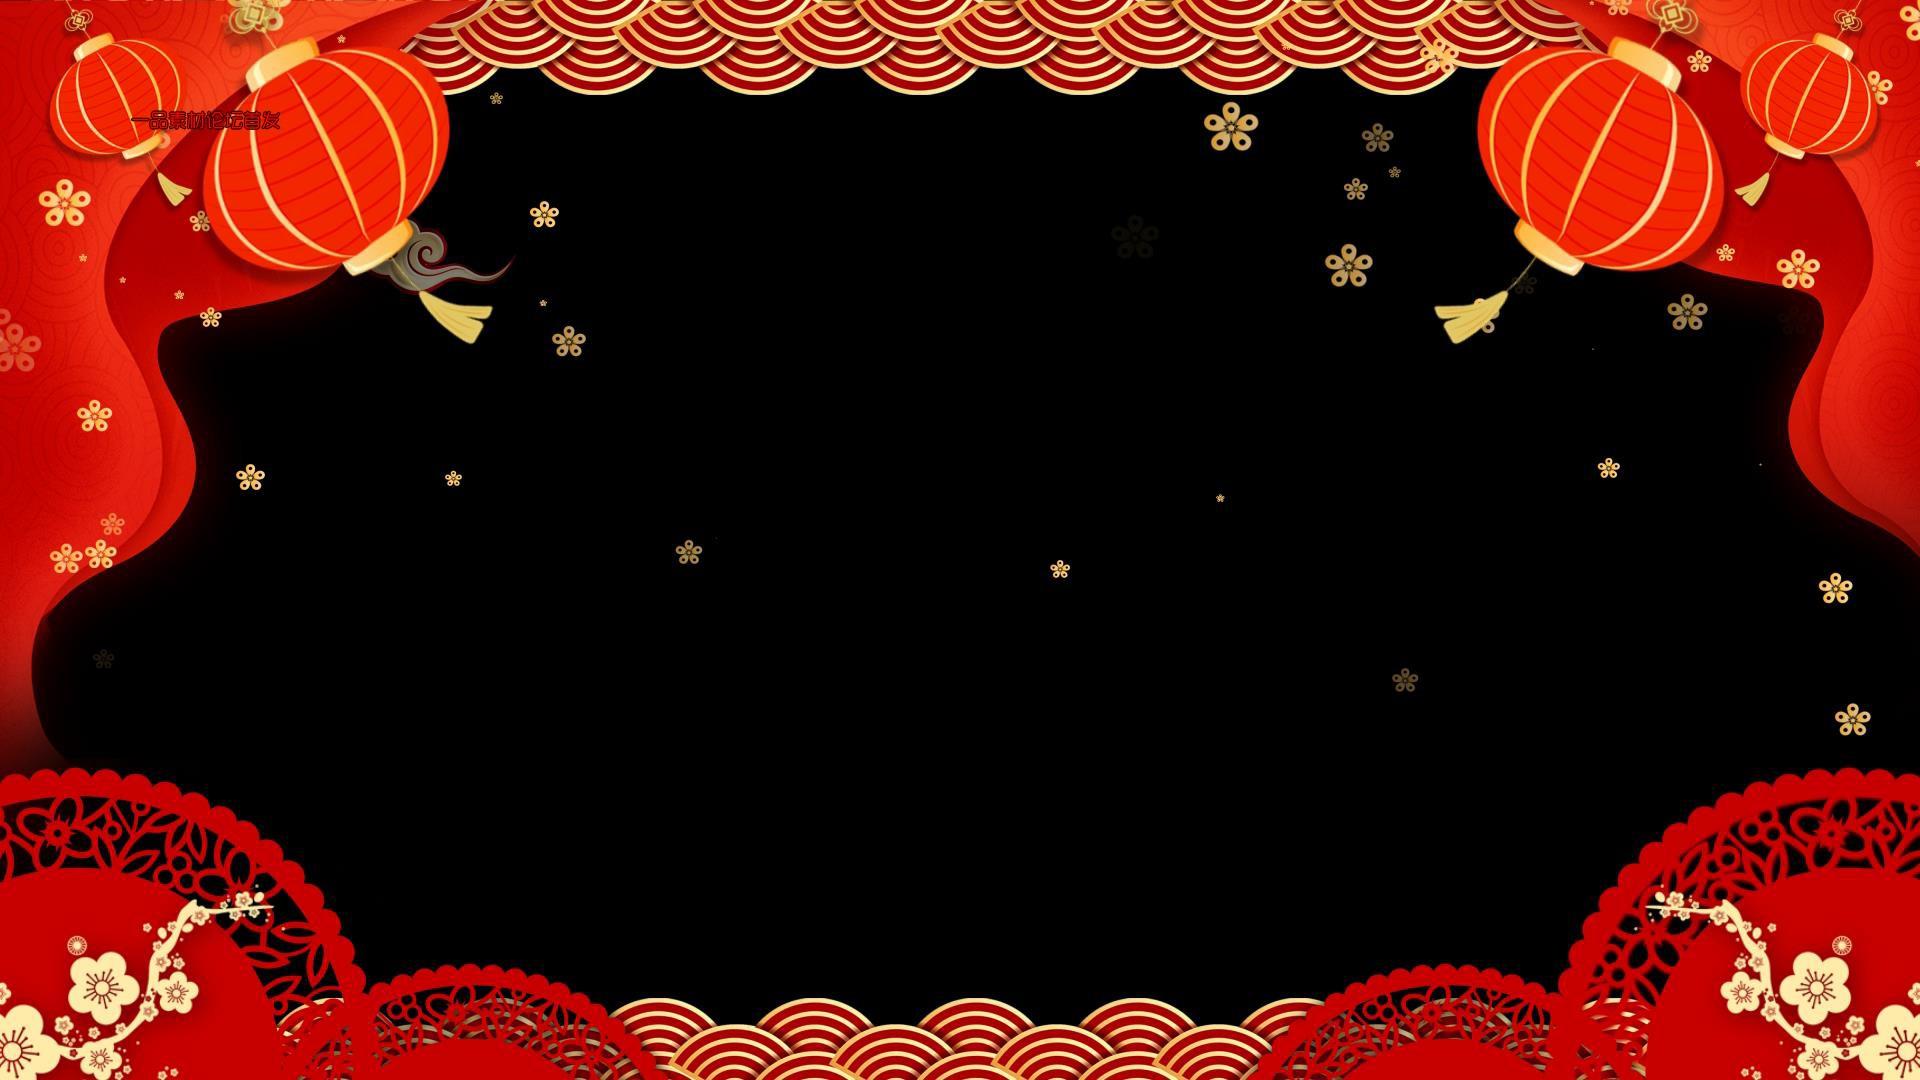 M00237 喜庆拜年边框(带通道)[00-00-00][20210123-190128449].jpg